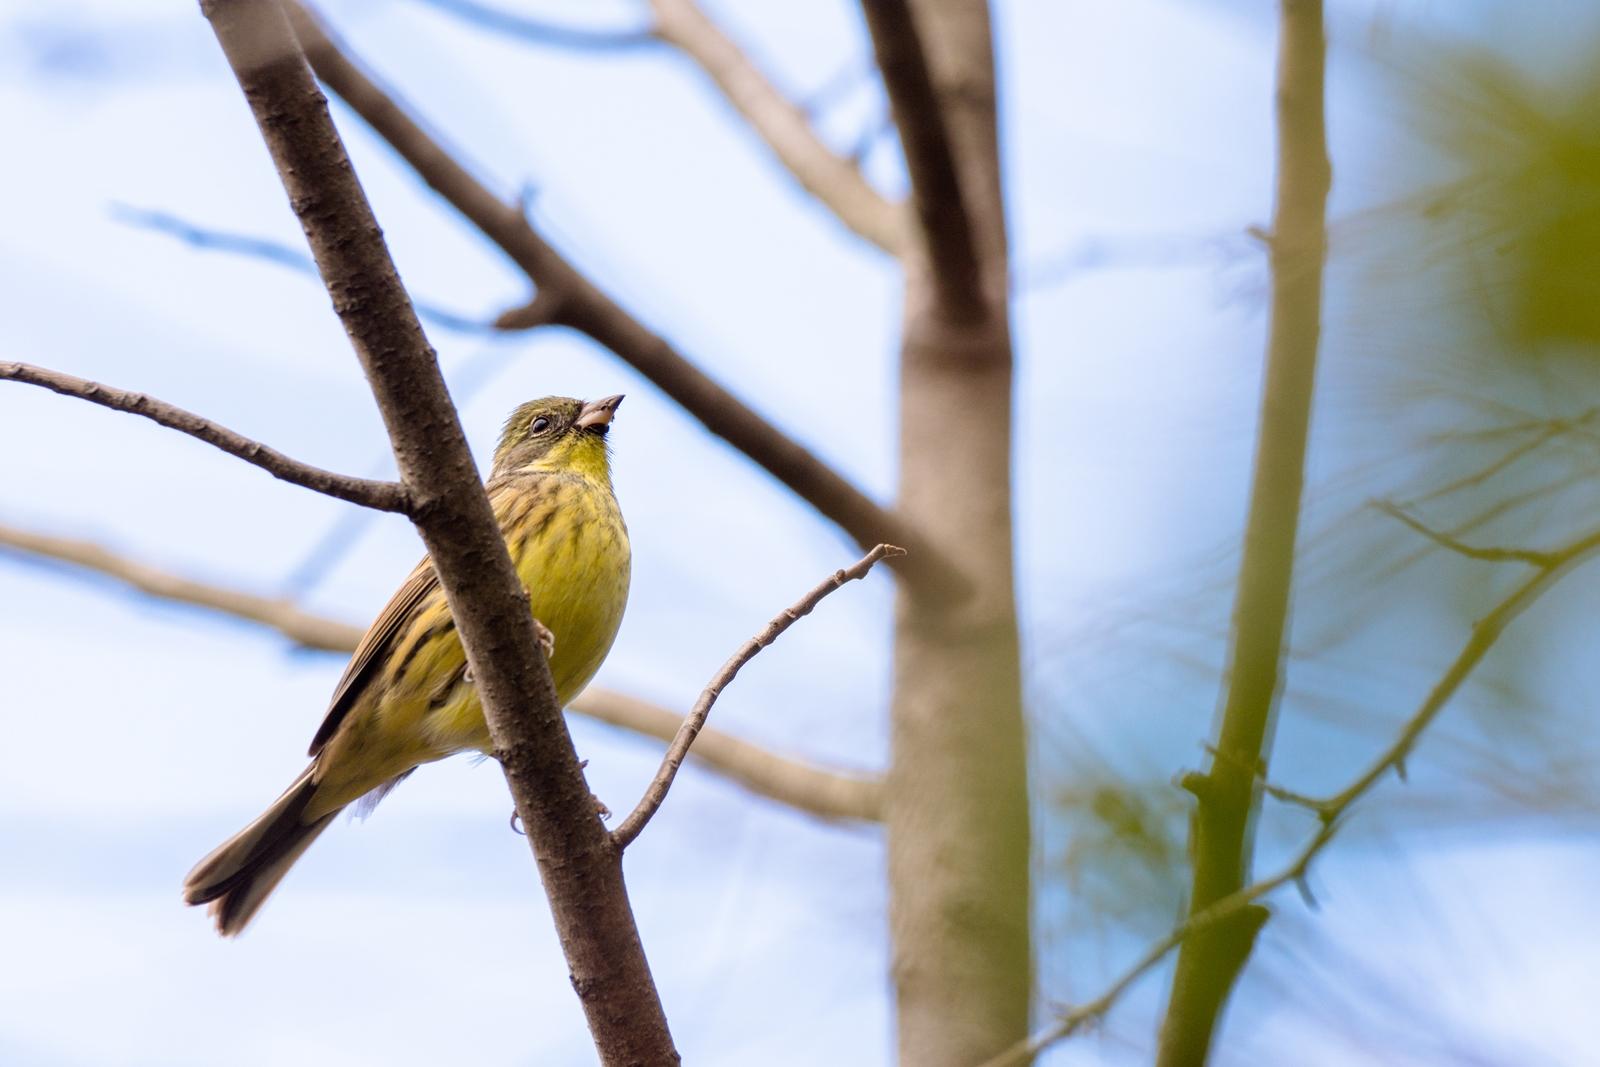 Photo: 「青い空へ」 / To the blue sky.  見上げる先 広がる冬の青 遮るもののない 解放された空へ  Black-faced bunting. (アオジ)  Nikon D7200 SIGMA 150-600mm F5-6.3 DG OS HSM Contemporary  #birdphotography #birds #kawaii #nikon #sigma #小鳥グラファー  ( http://takafumiooshio.com/archives/744 )